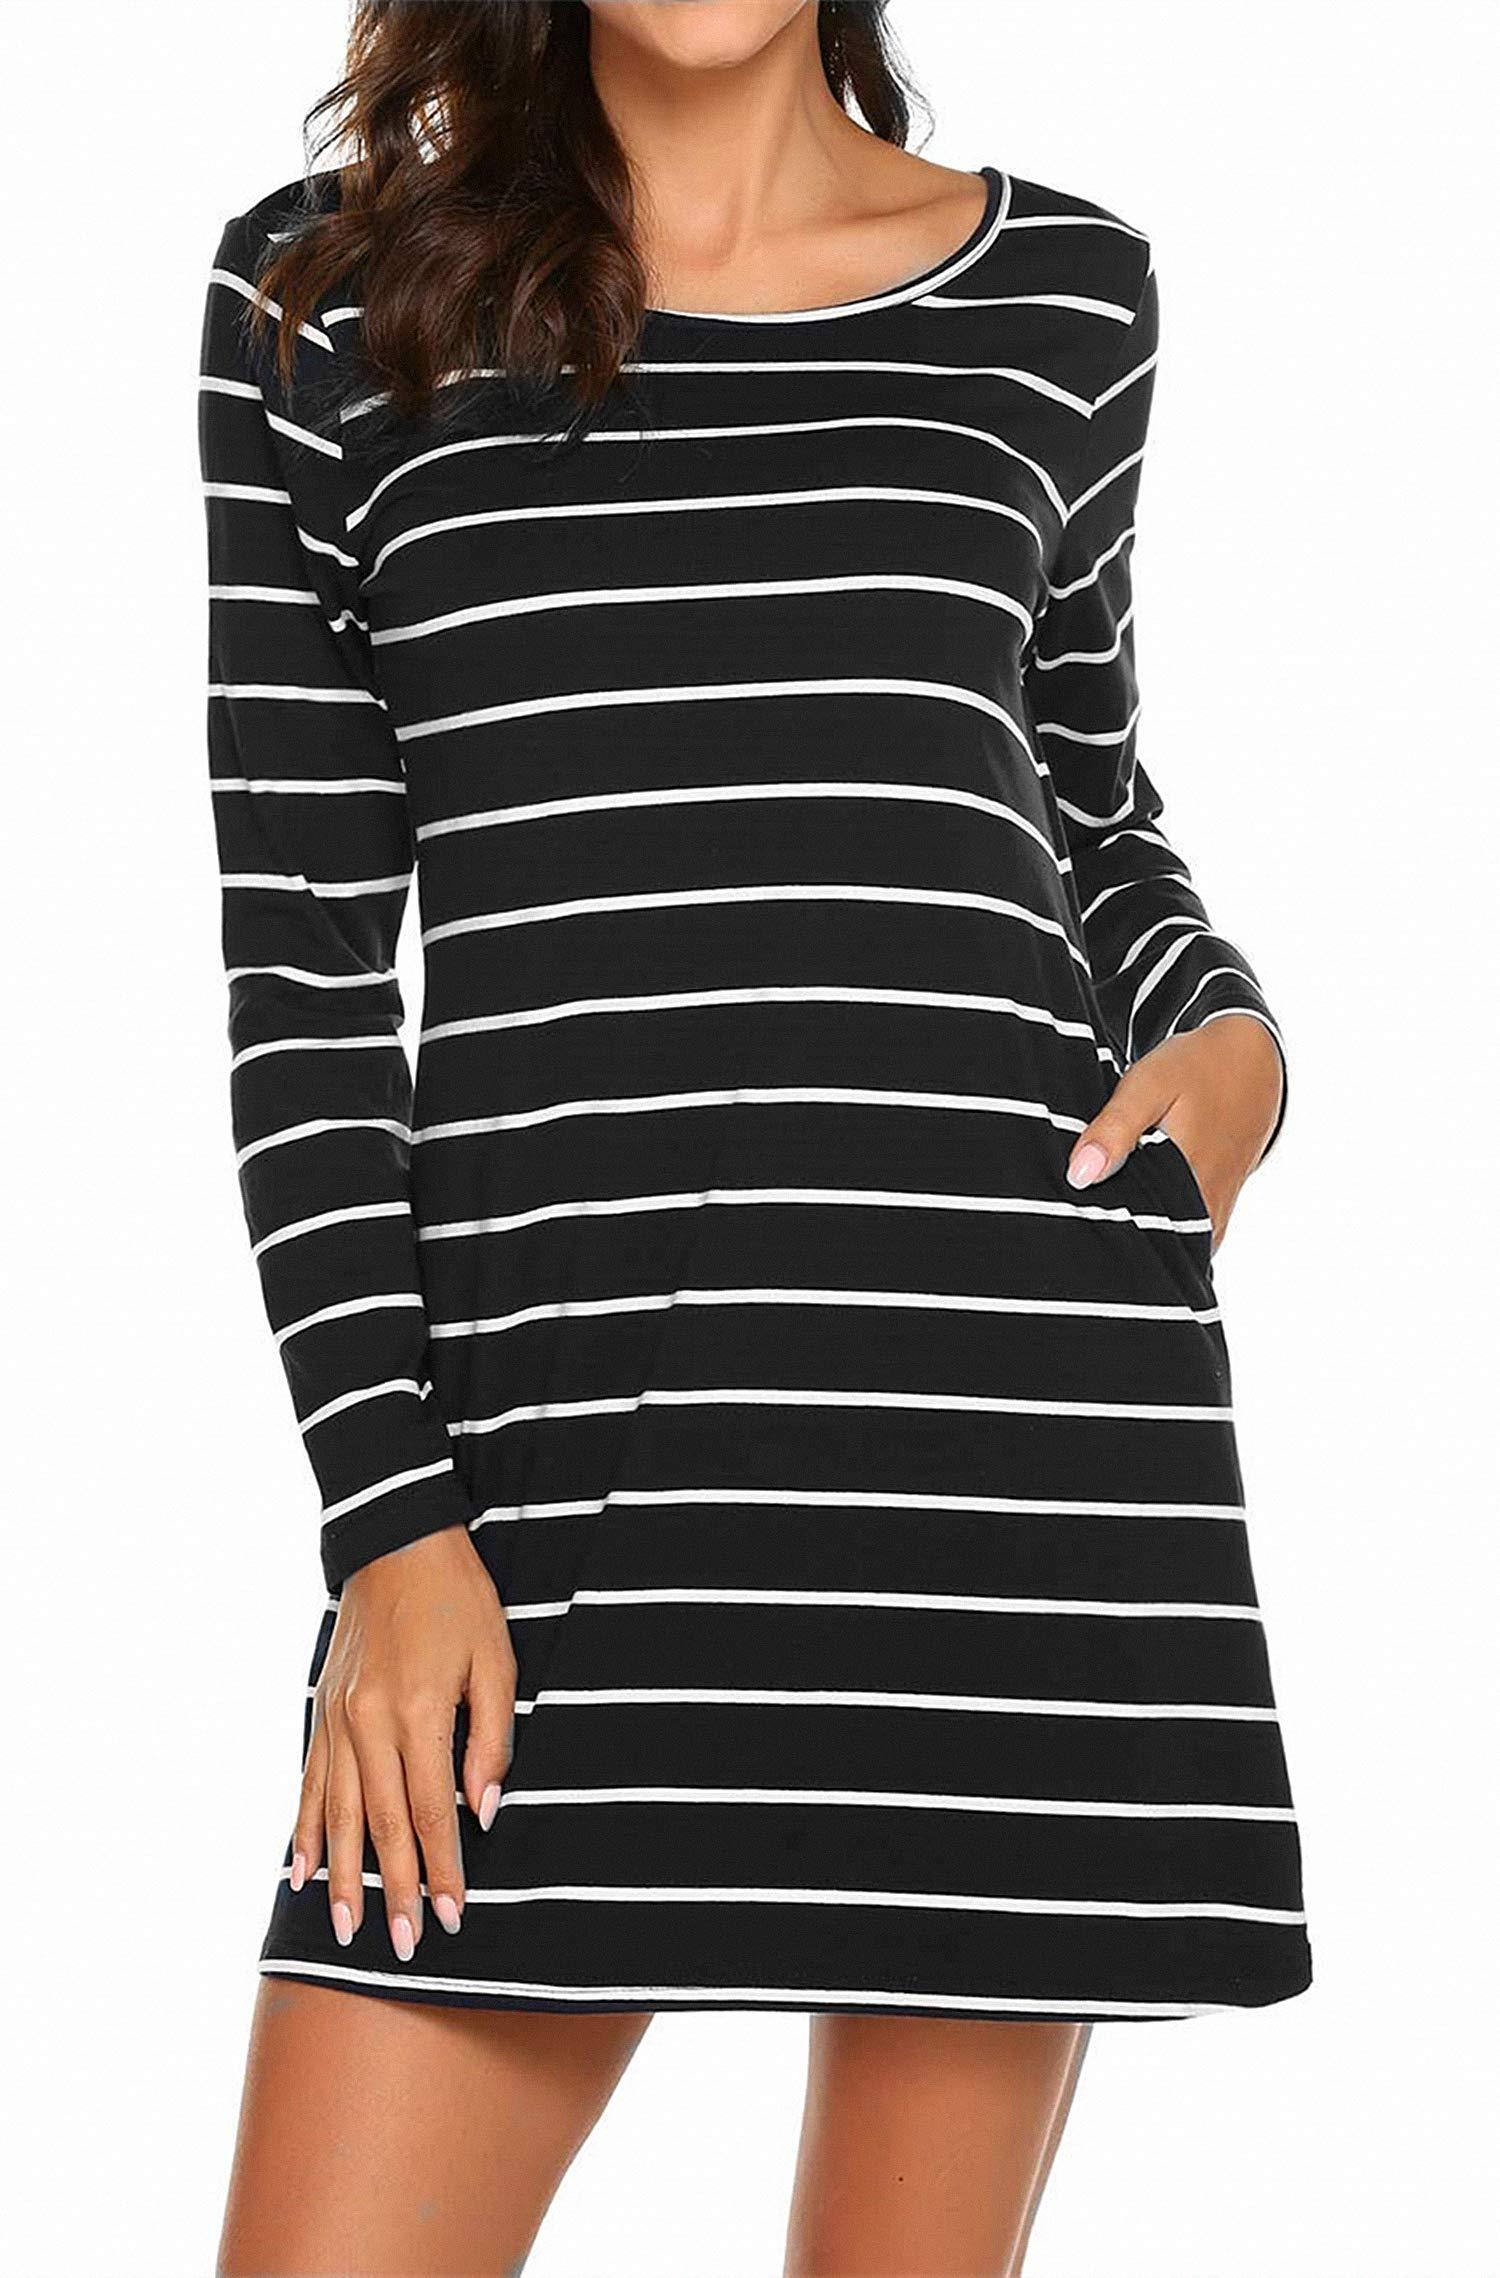 Women T Shirt Dress Pockets Striped Causal Long Sleeve Cross Back Travel Outfit